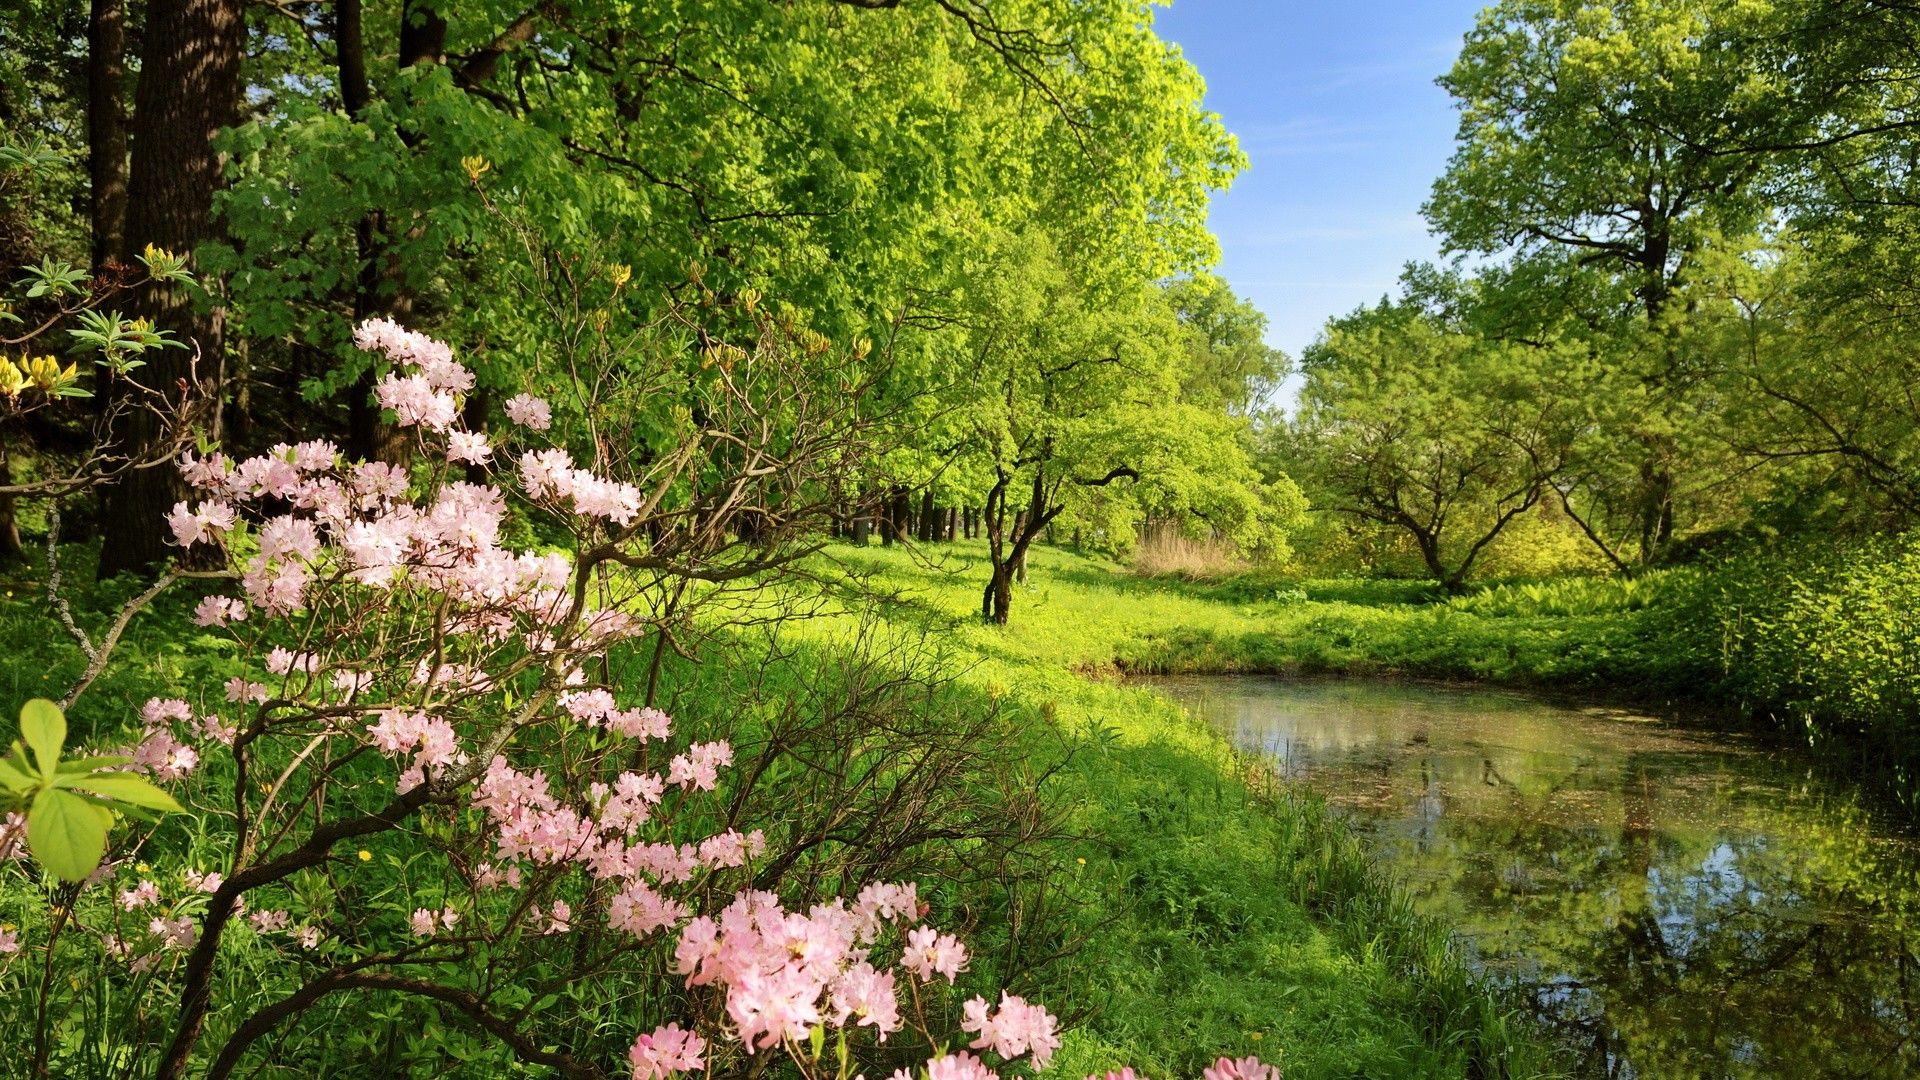 Landscapes Nature Trees Pond Flowers Spring Landscape Spring Wallpaper Wall Murals